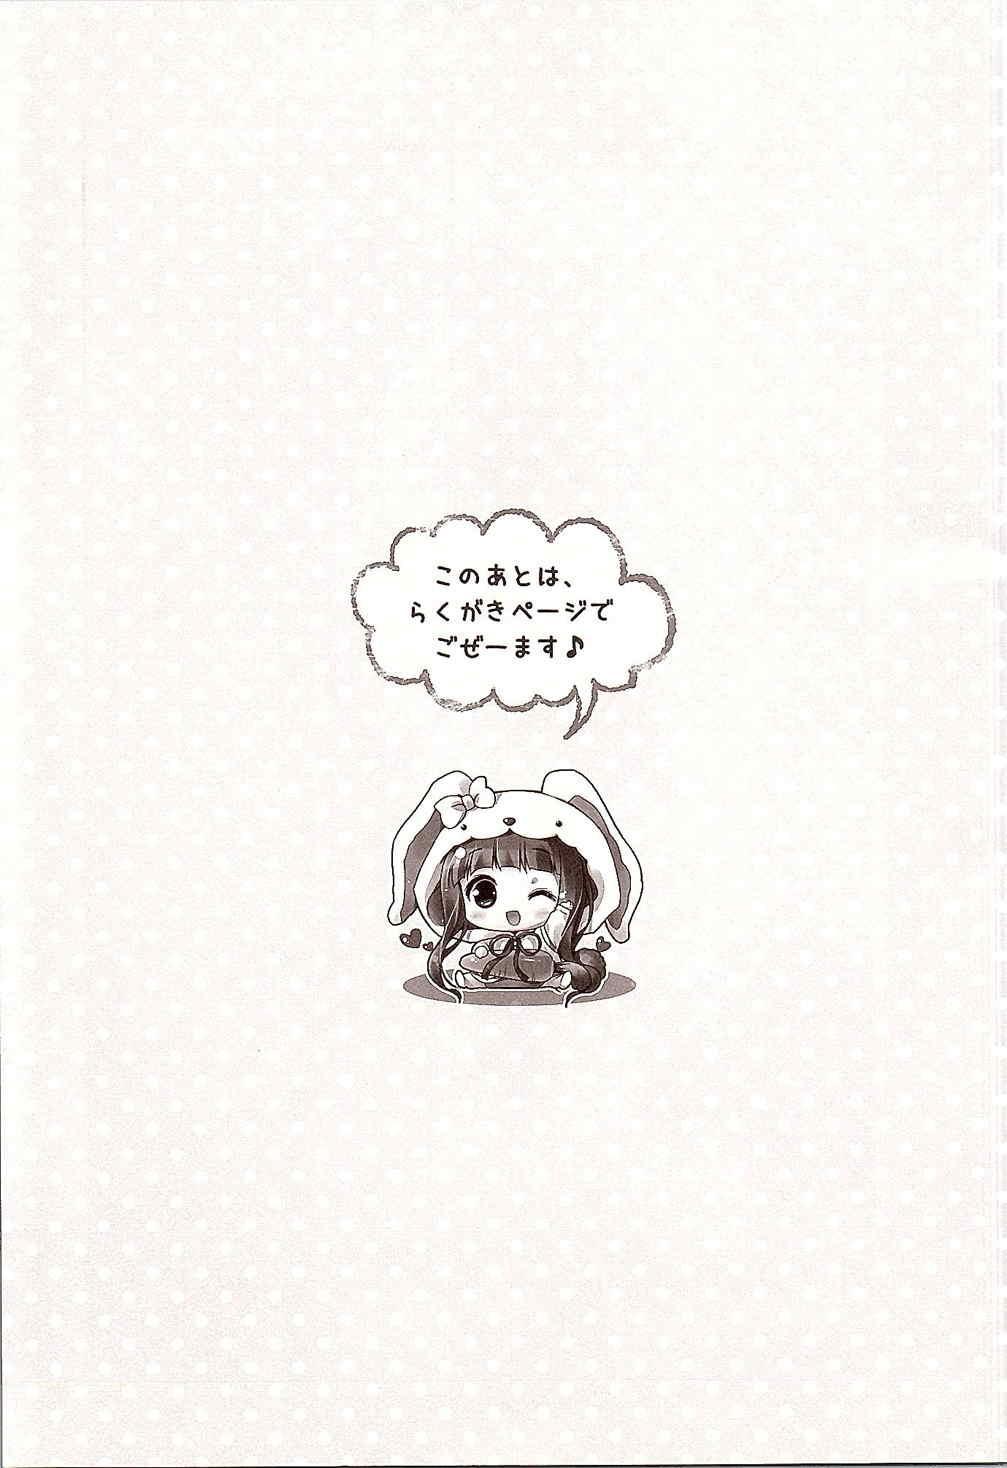 Nina-chan to, Issho. 27